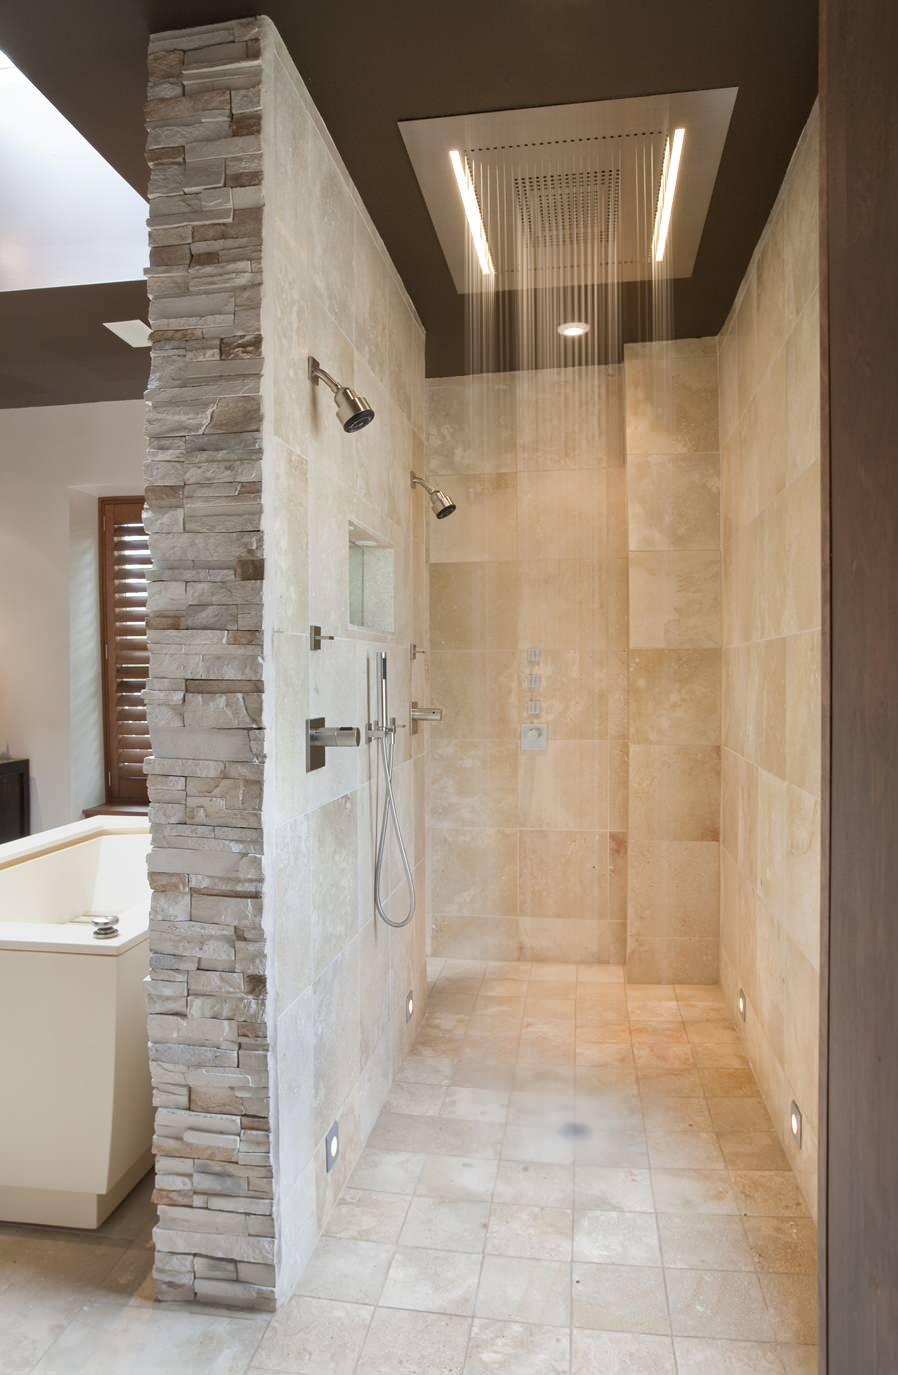 rain head shower beige wall stone tiled wall dark colored ceiling walk in shower space marble floor